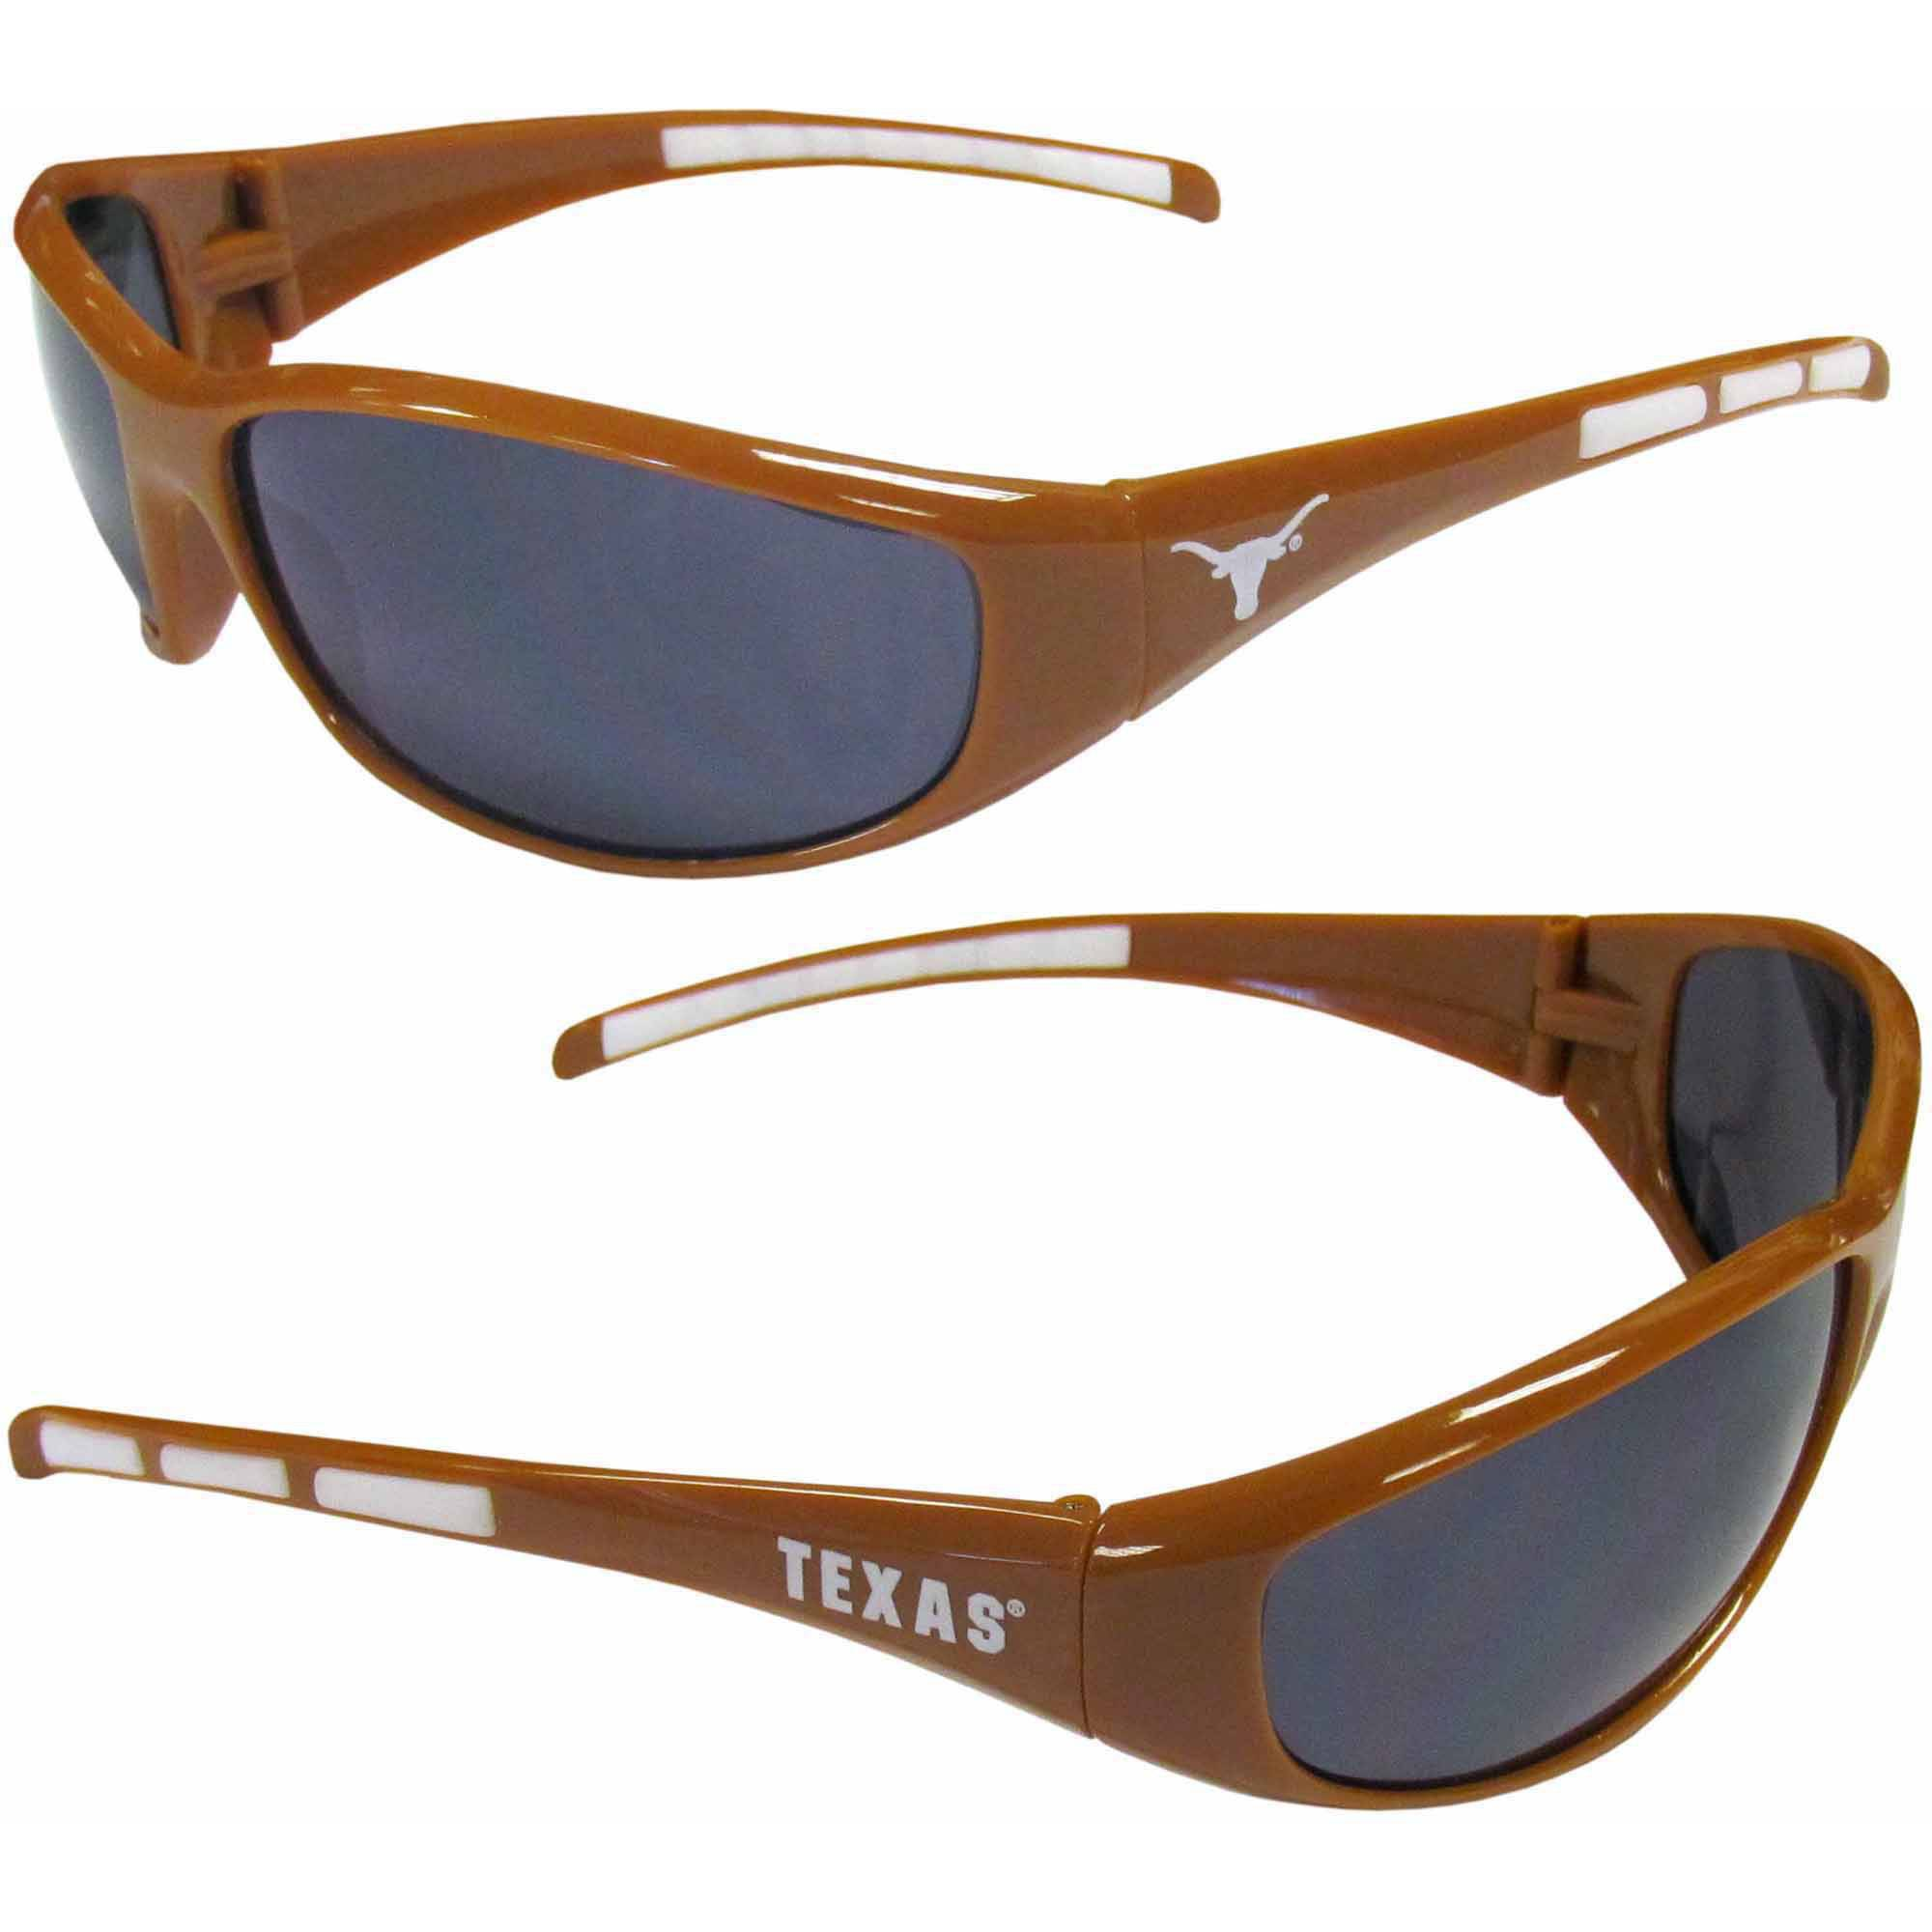 NCAA Texas Wrap Sunglasses